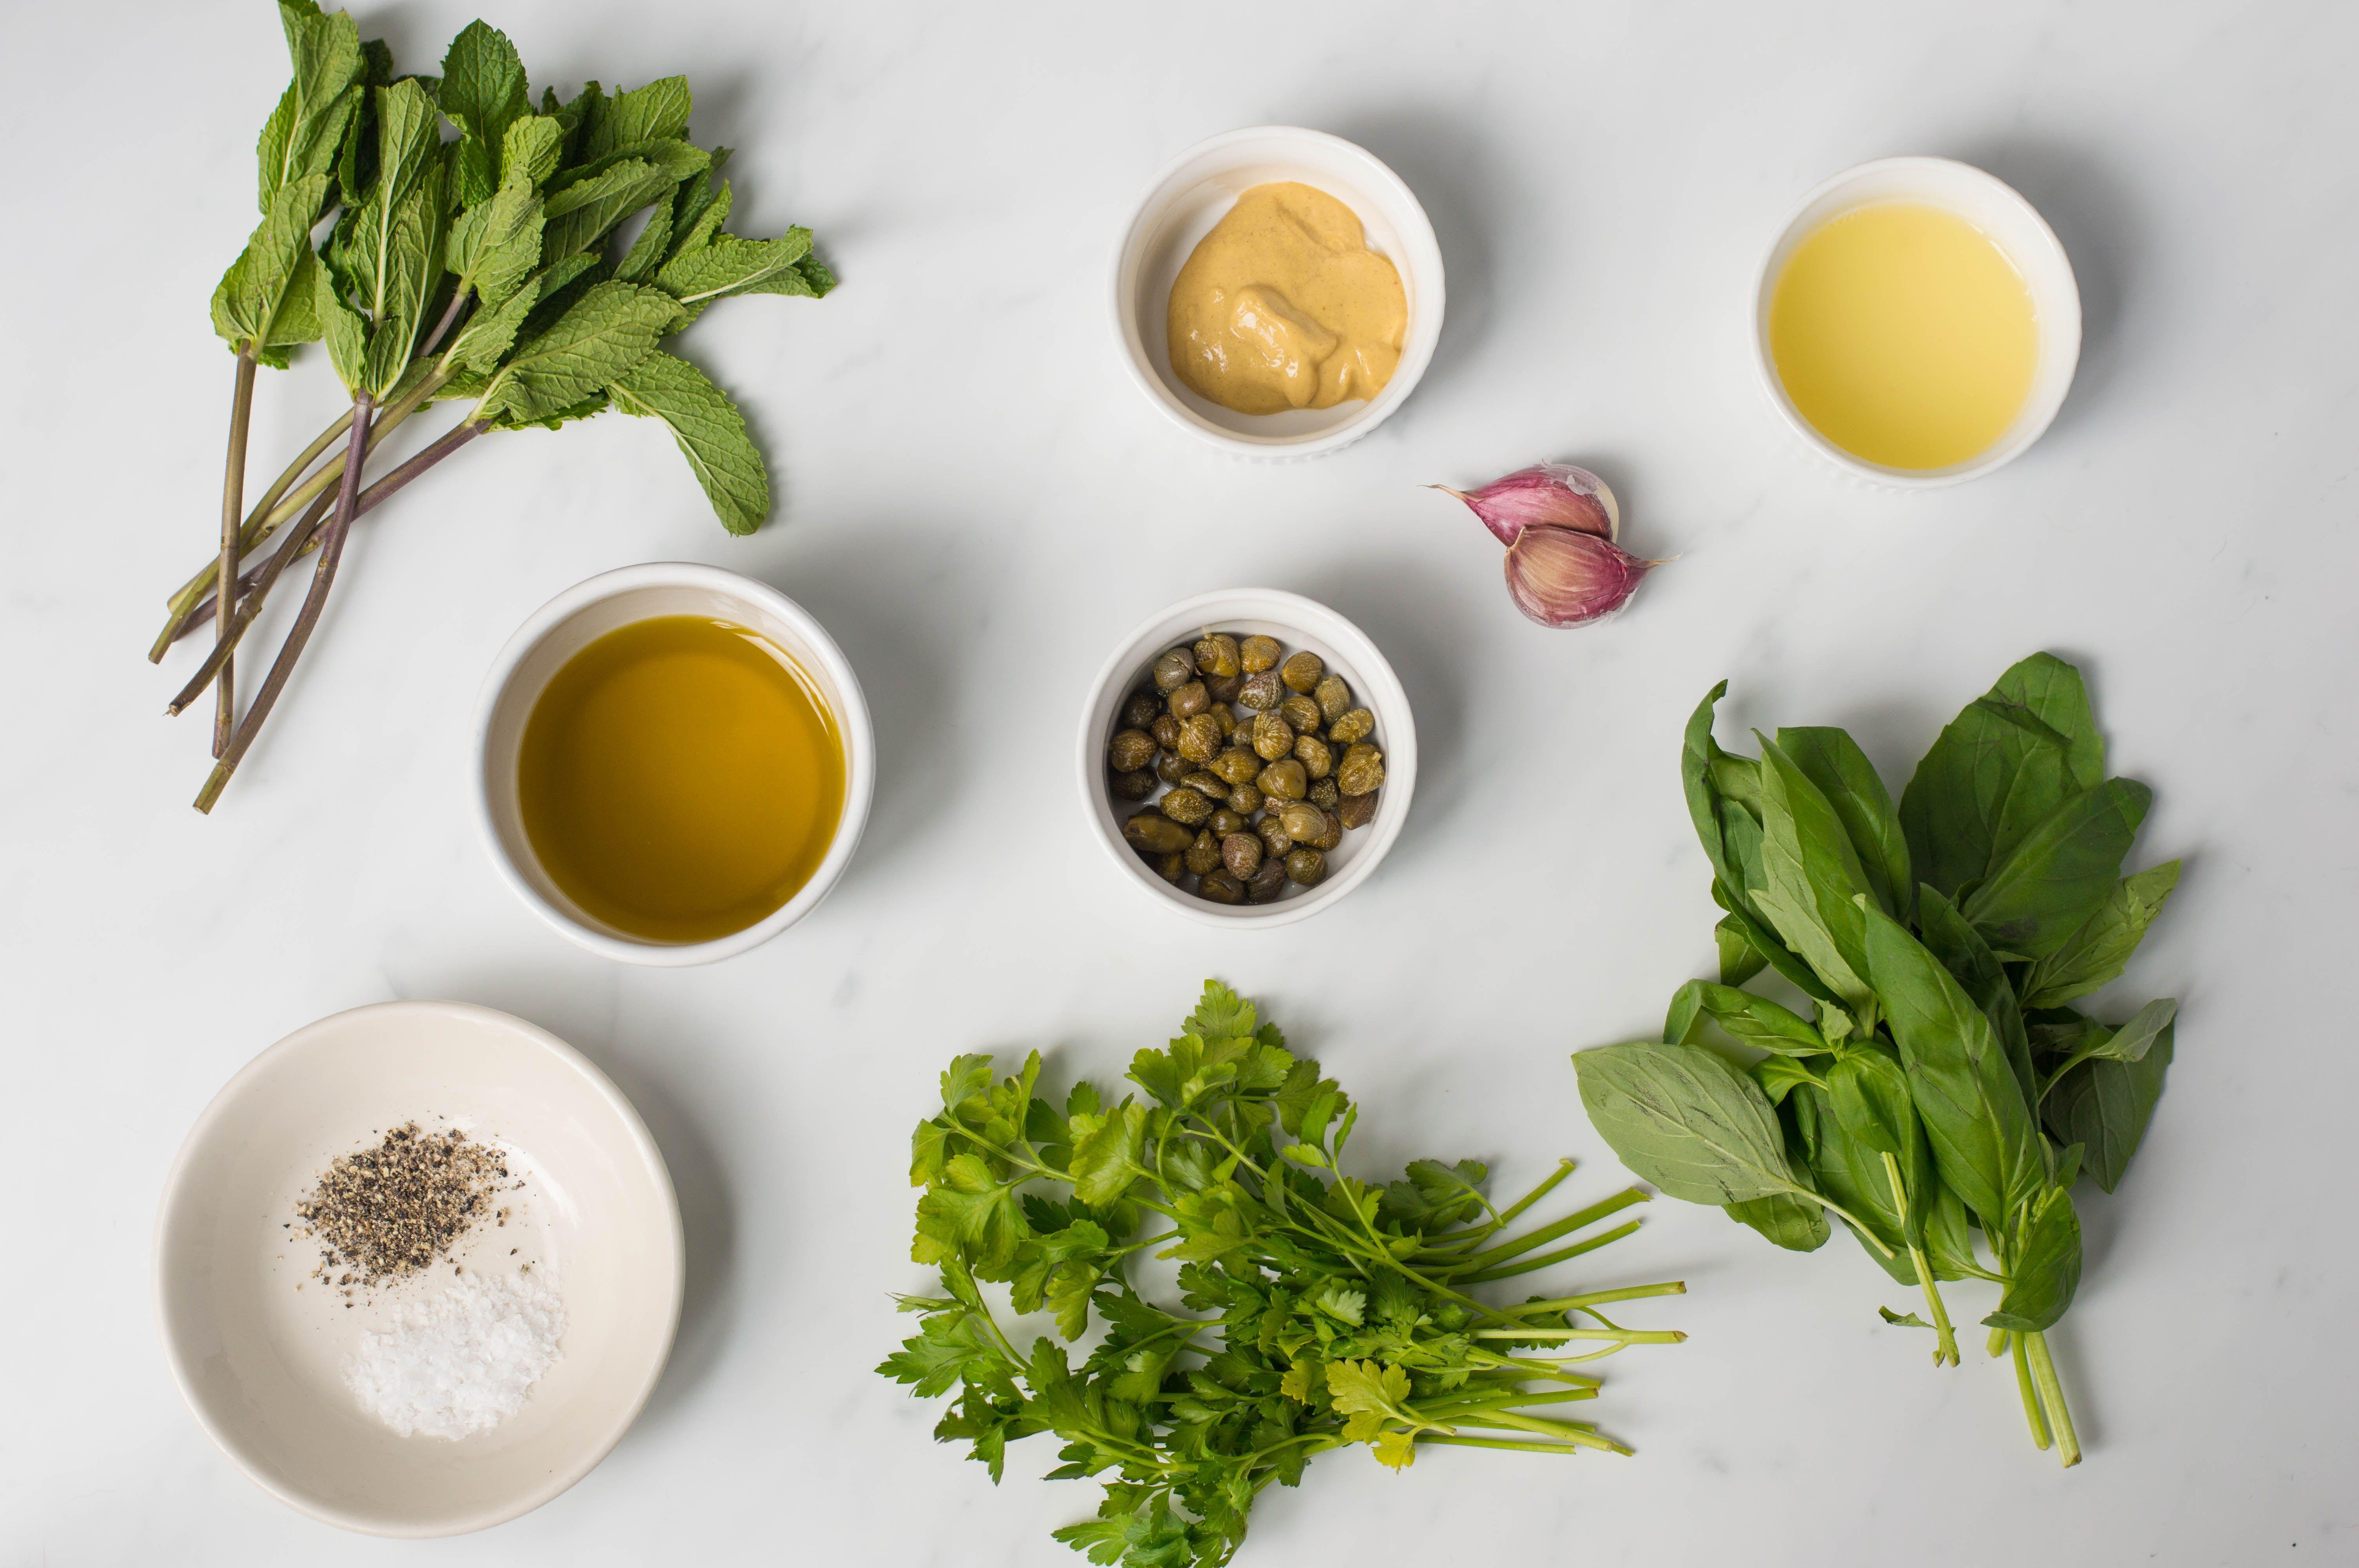 Ingredients for making salsa verde